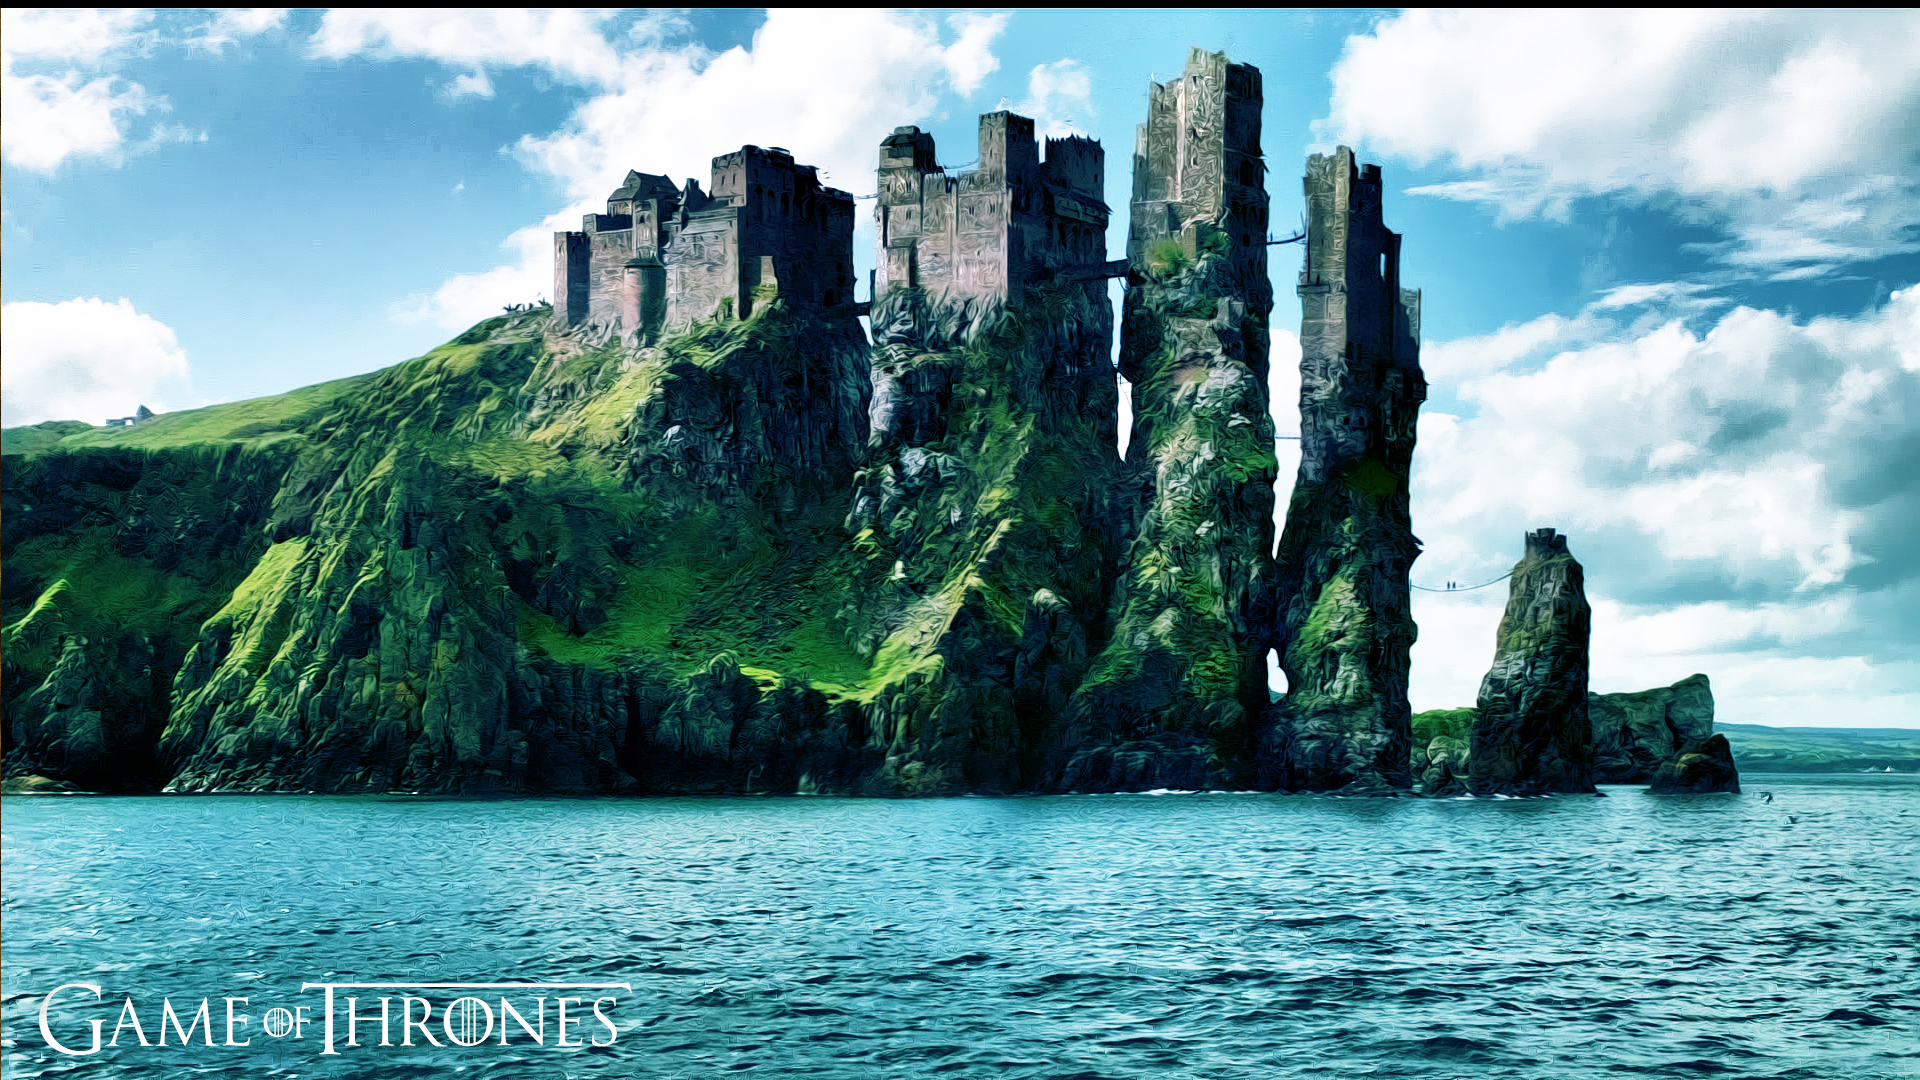 Game of Thrones Desktop Wallpapers   Wallpaper High Definition High 1920x1080